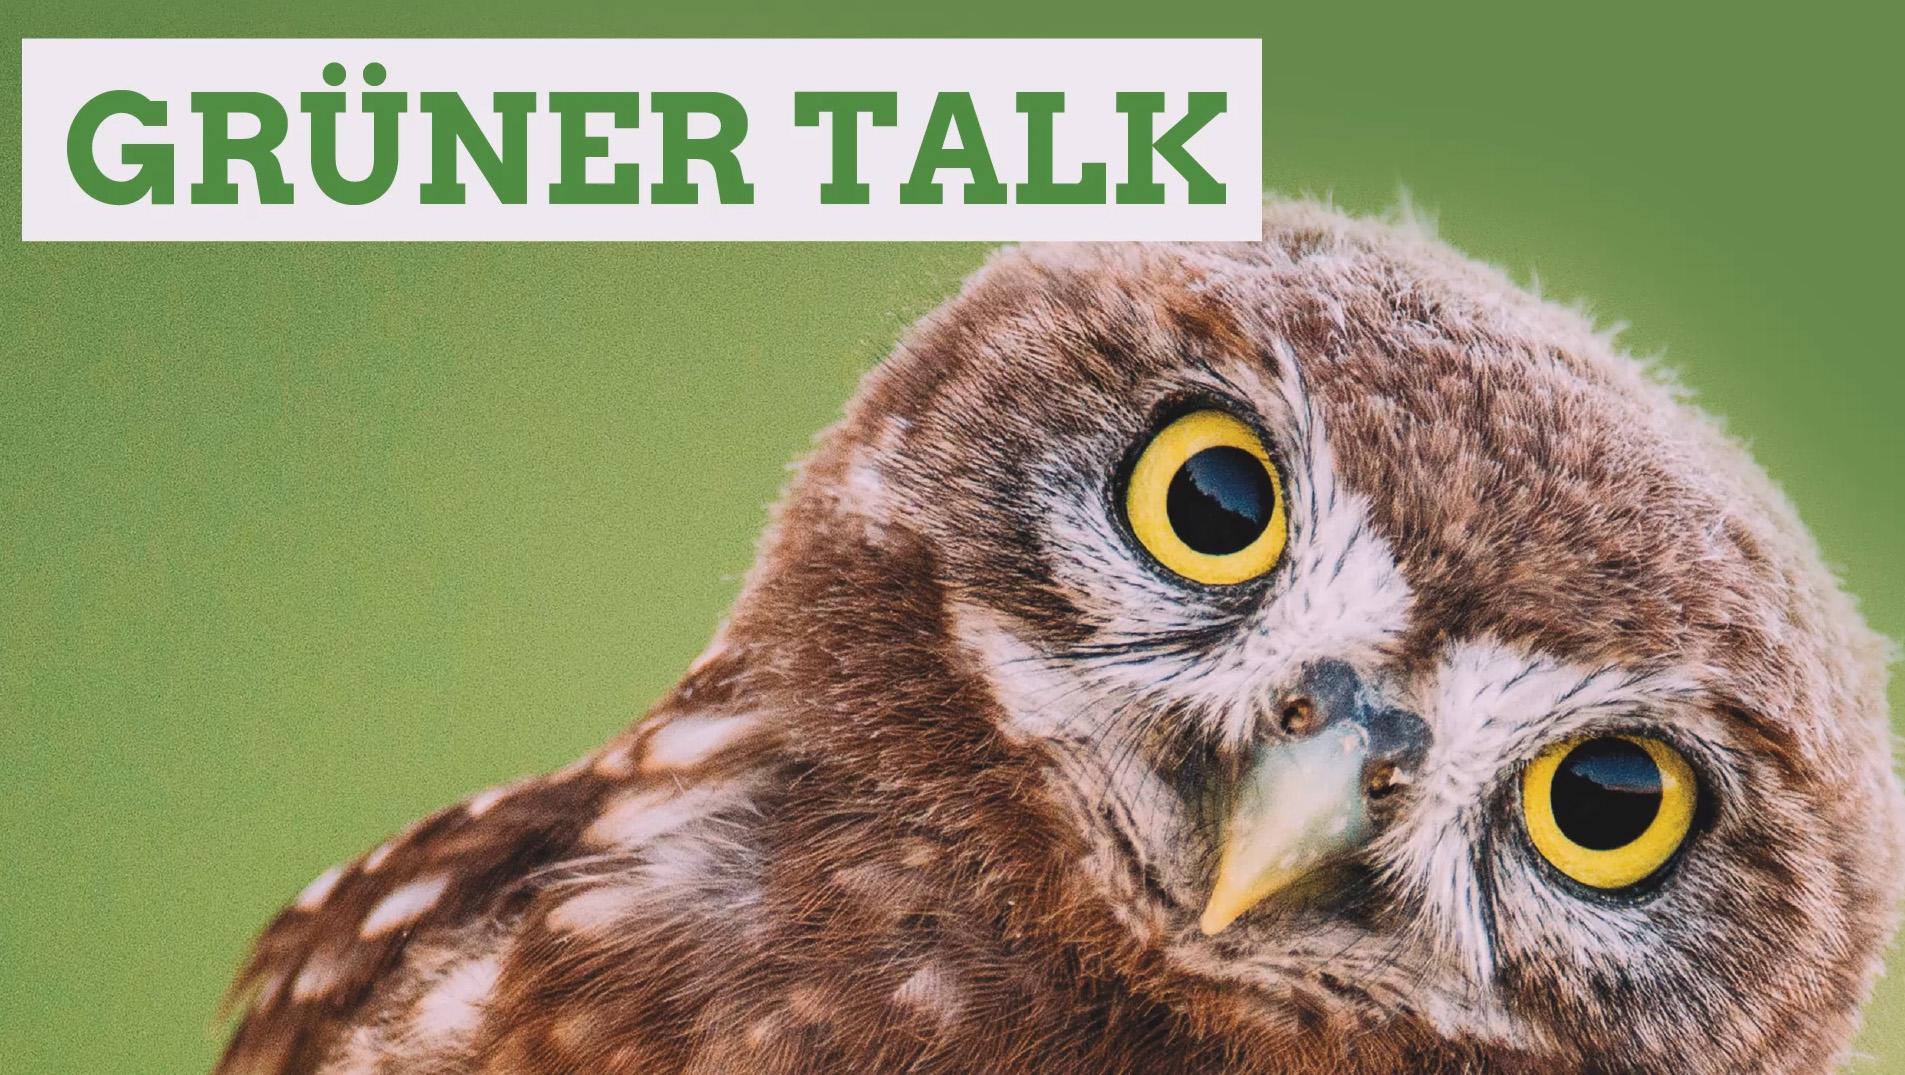 Grüner Talk Tegernsee #1